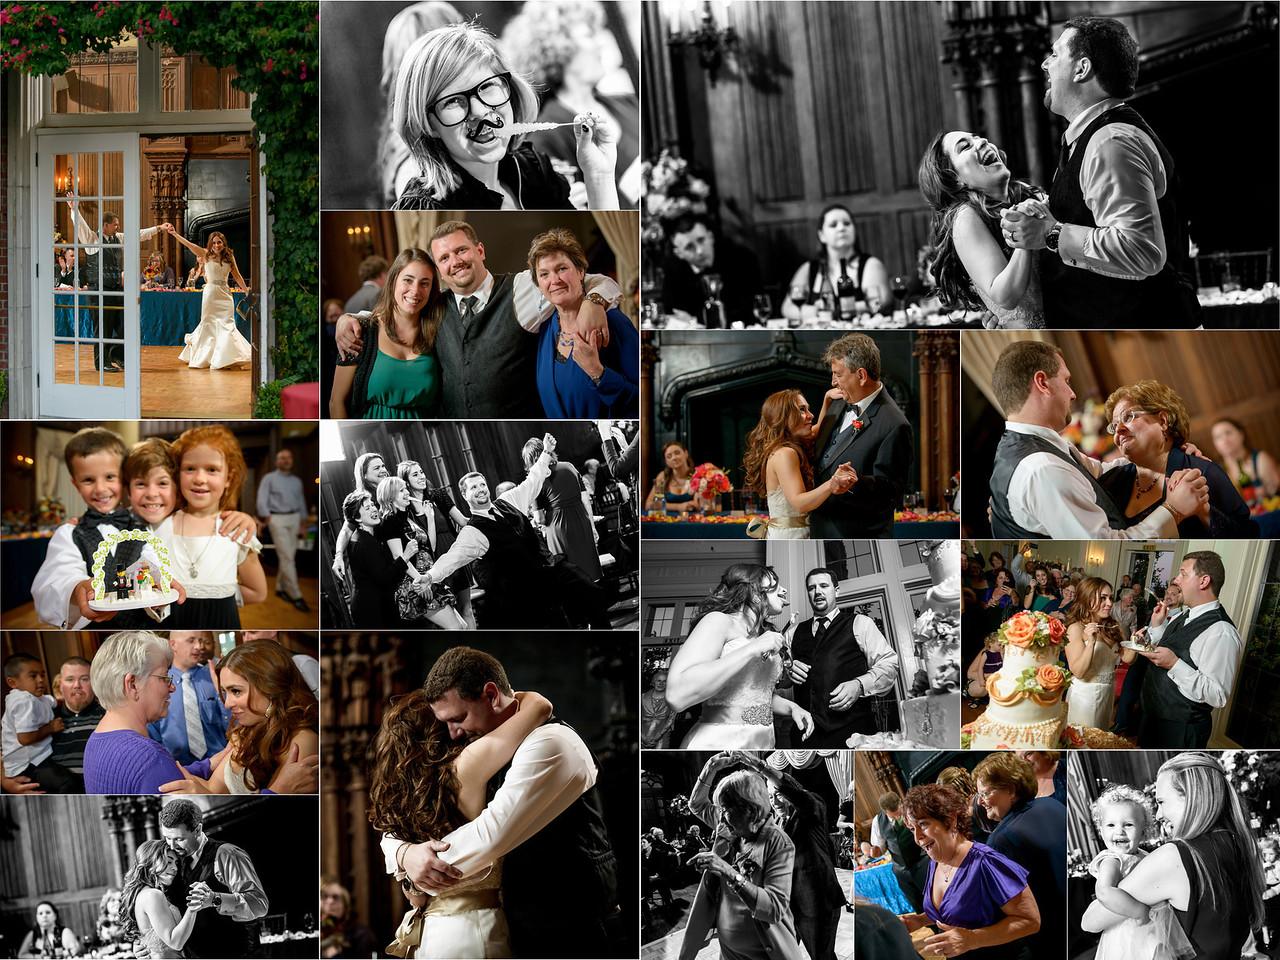 Danielle_and_Tony_Wedding_Photography_4x6_Photo_Board_06